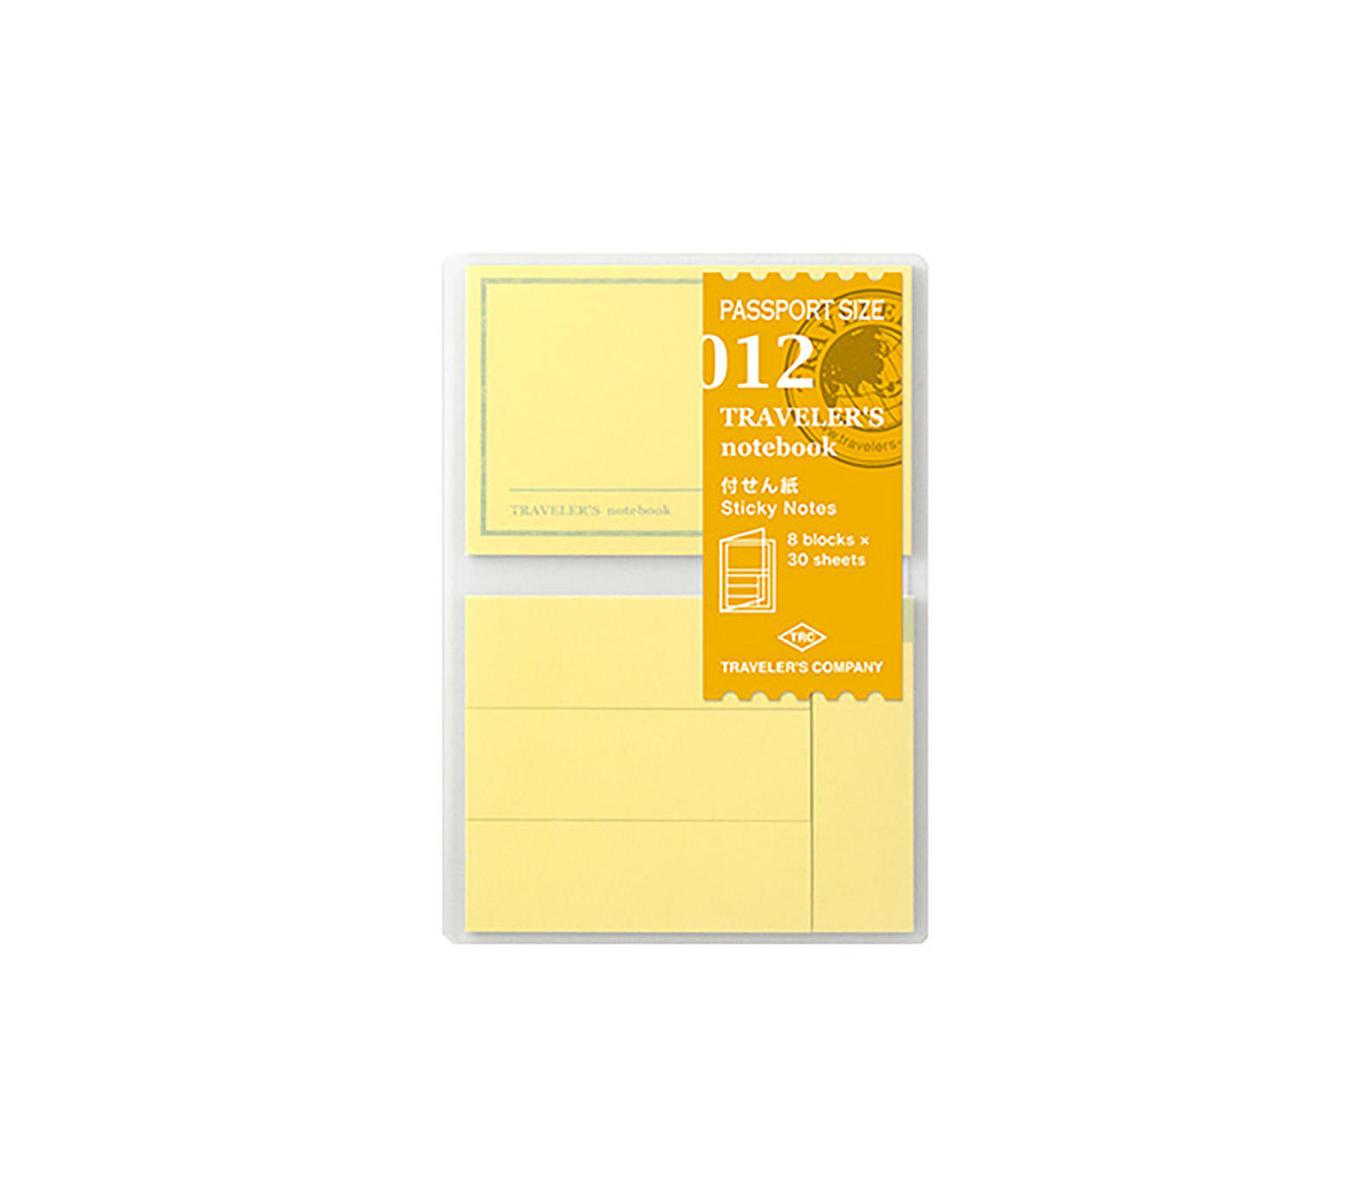 Traveler's Notebook recarga passport size 012